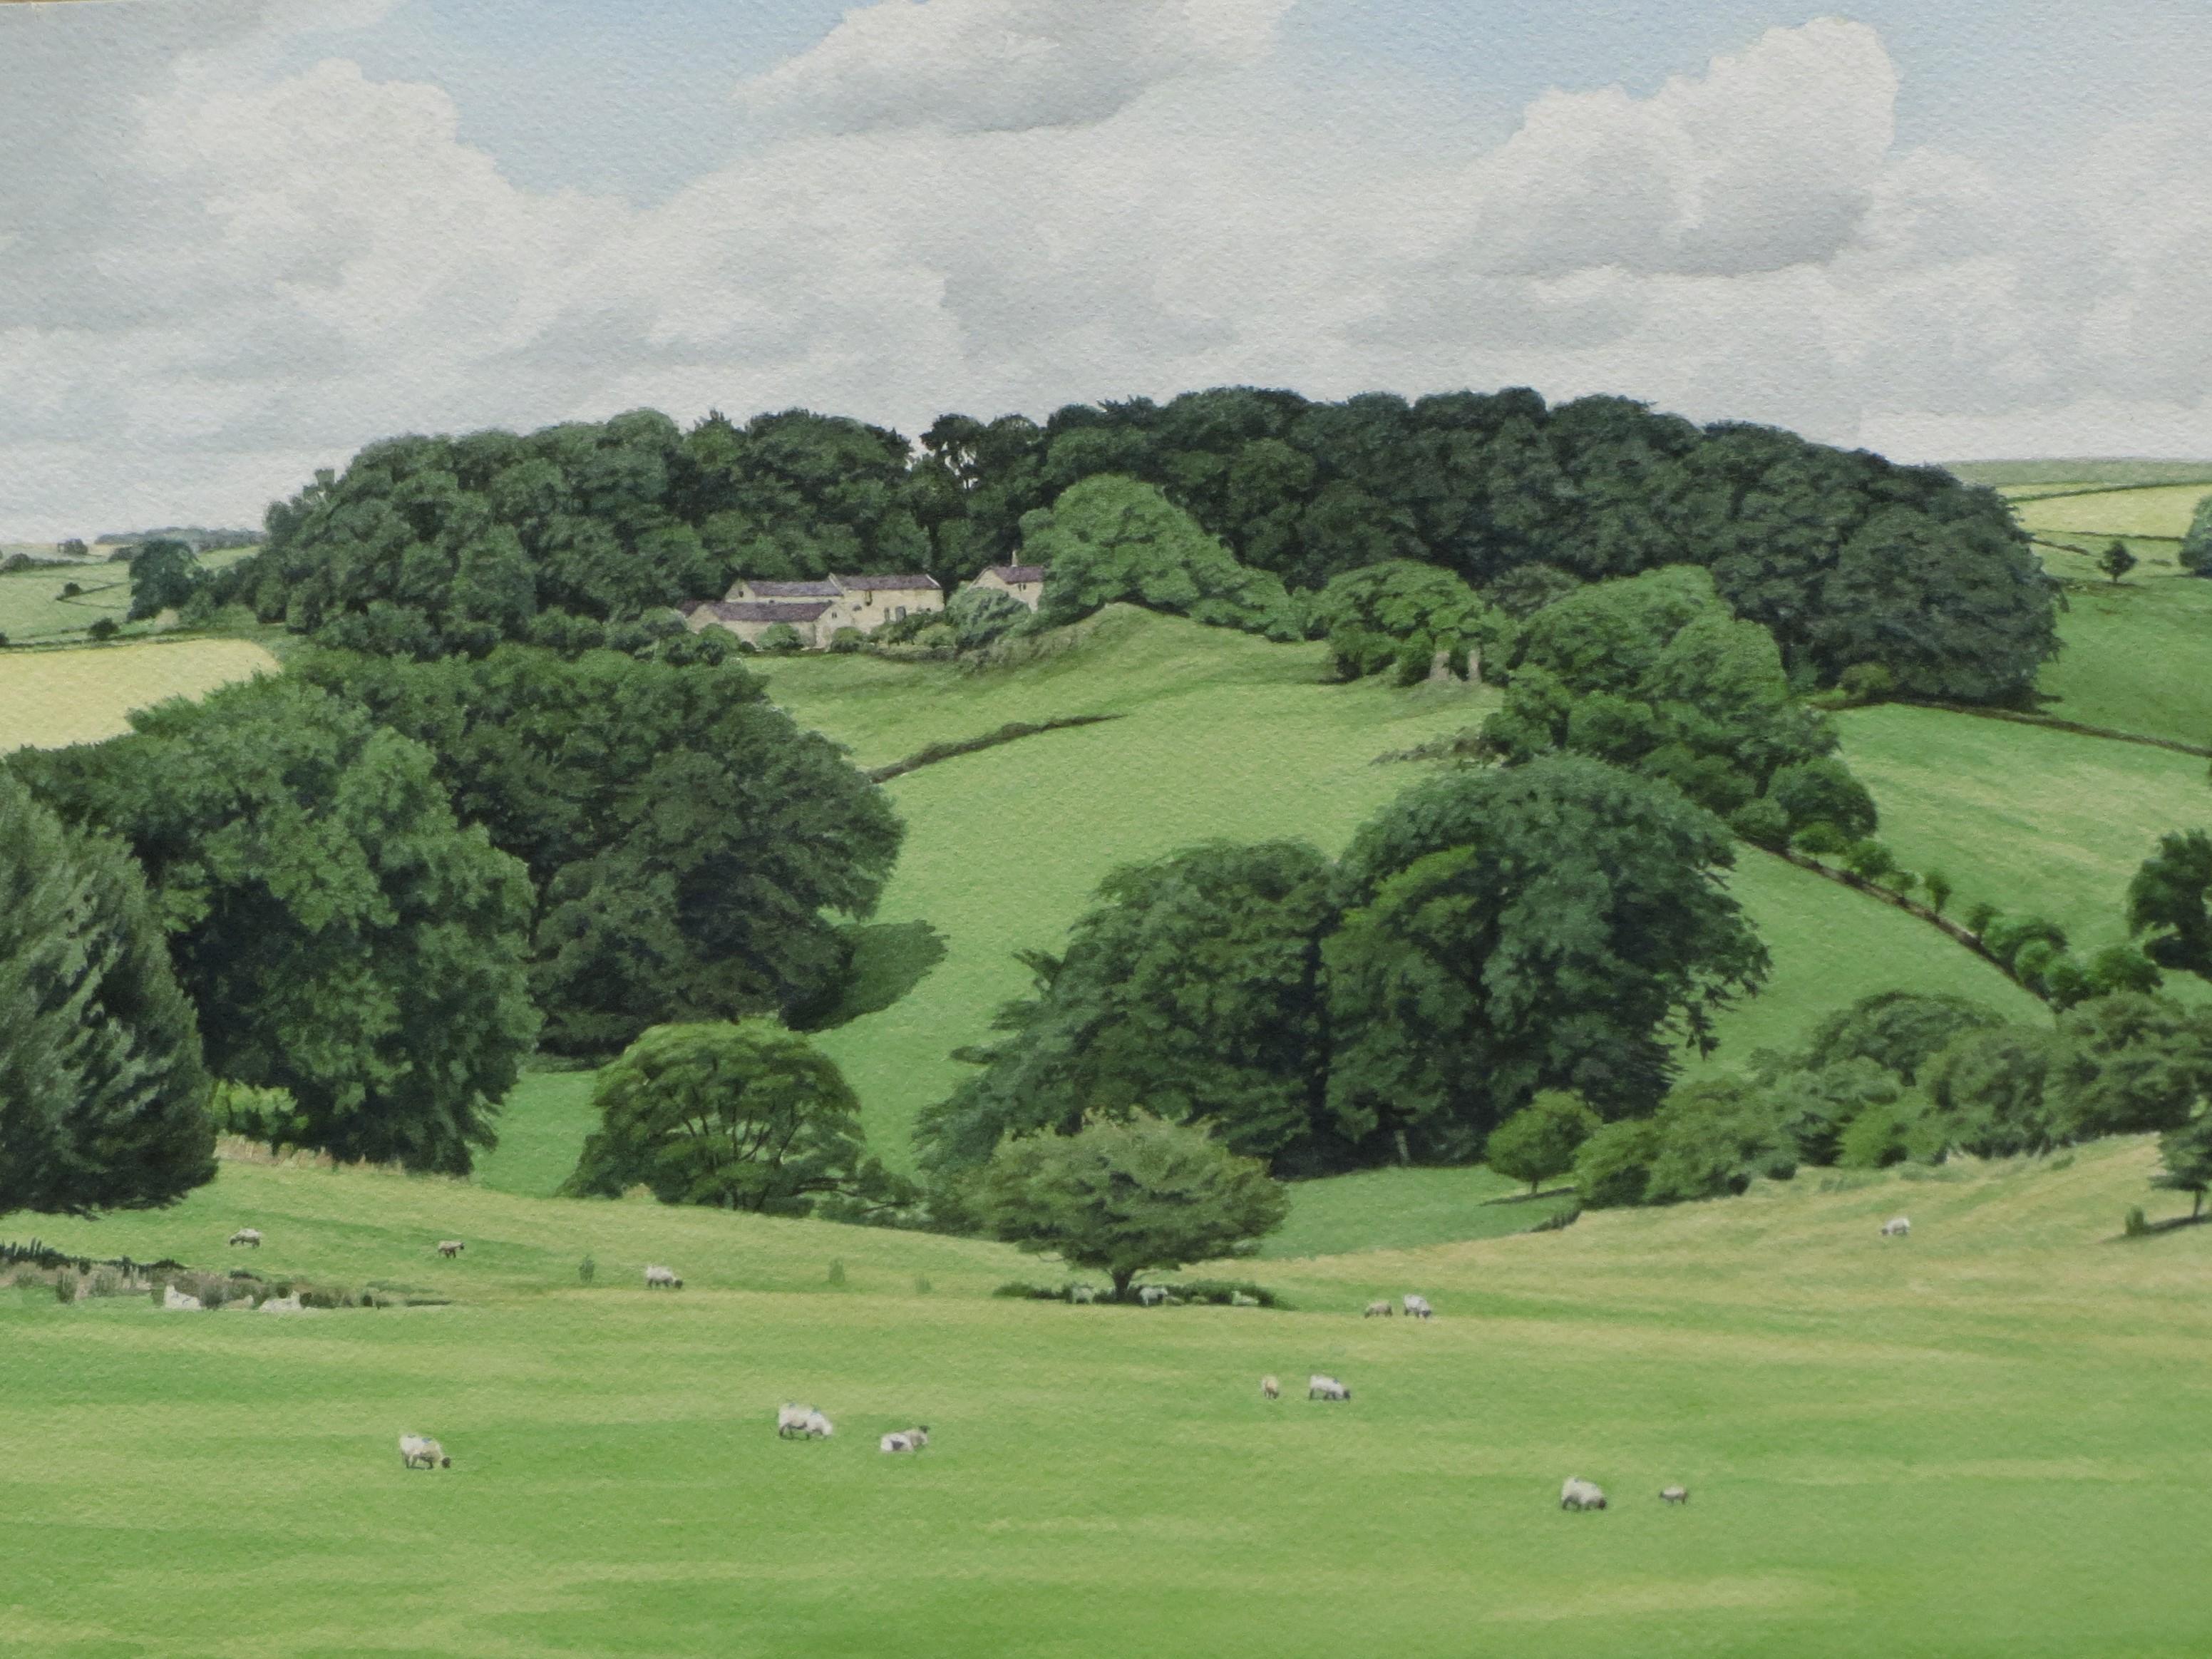 Ballidonmoor Farm 35.5 x 26 £600